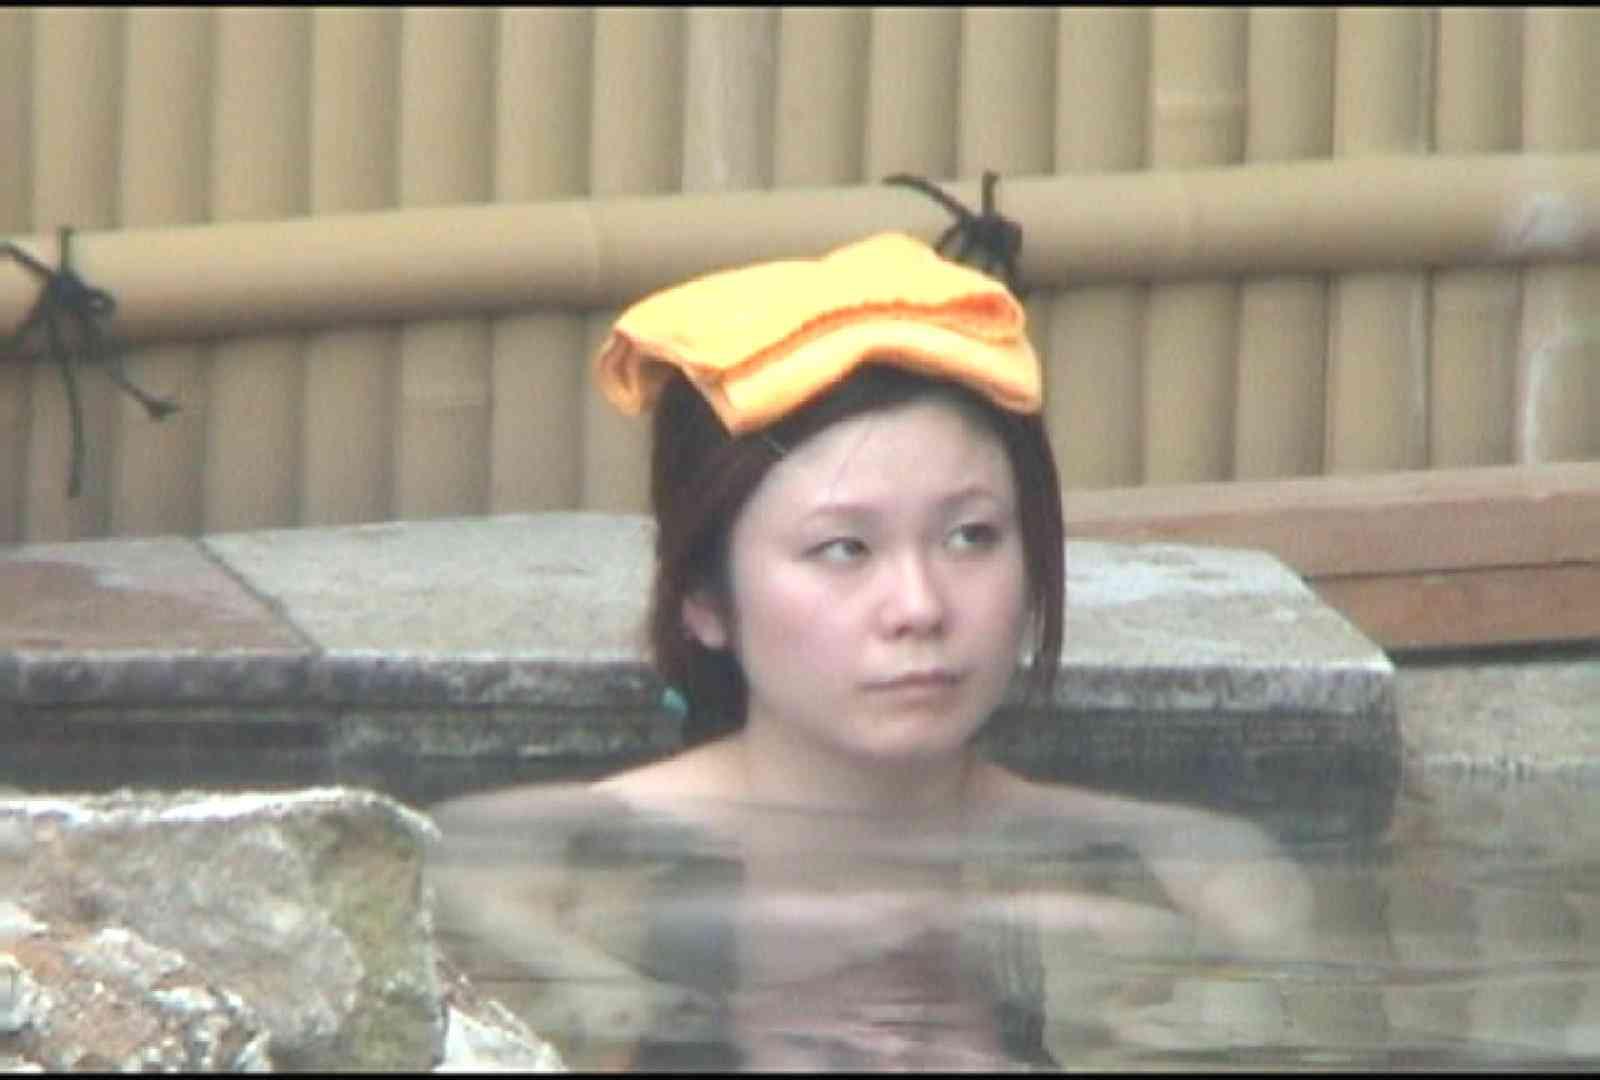 Aquaな露天風呂Vol.177 盗撮師作品  102pic 78